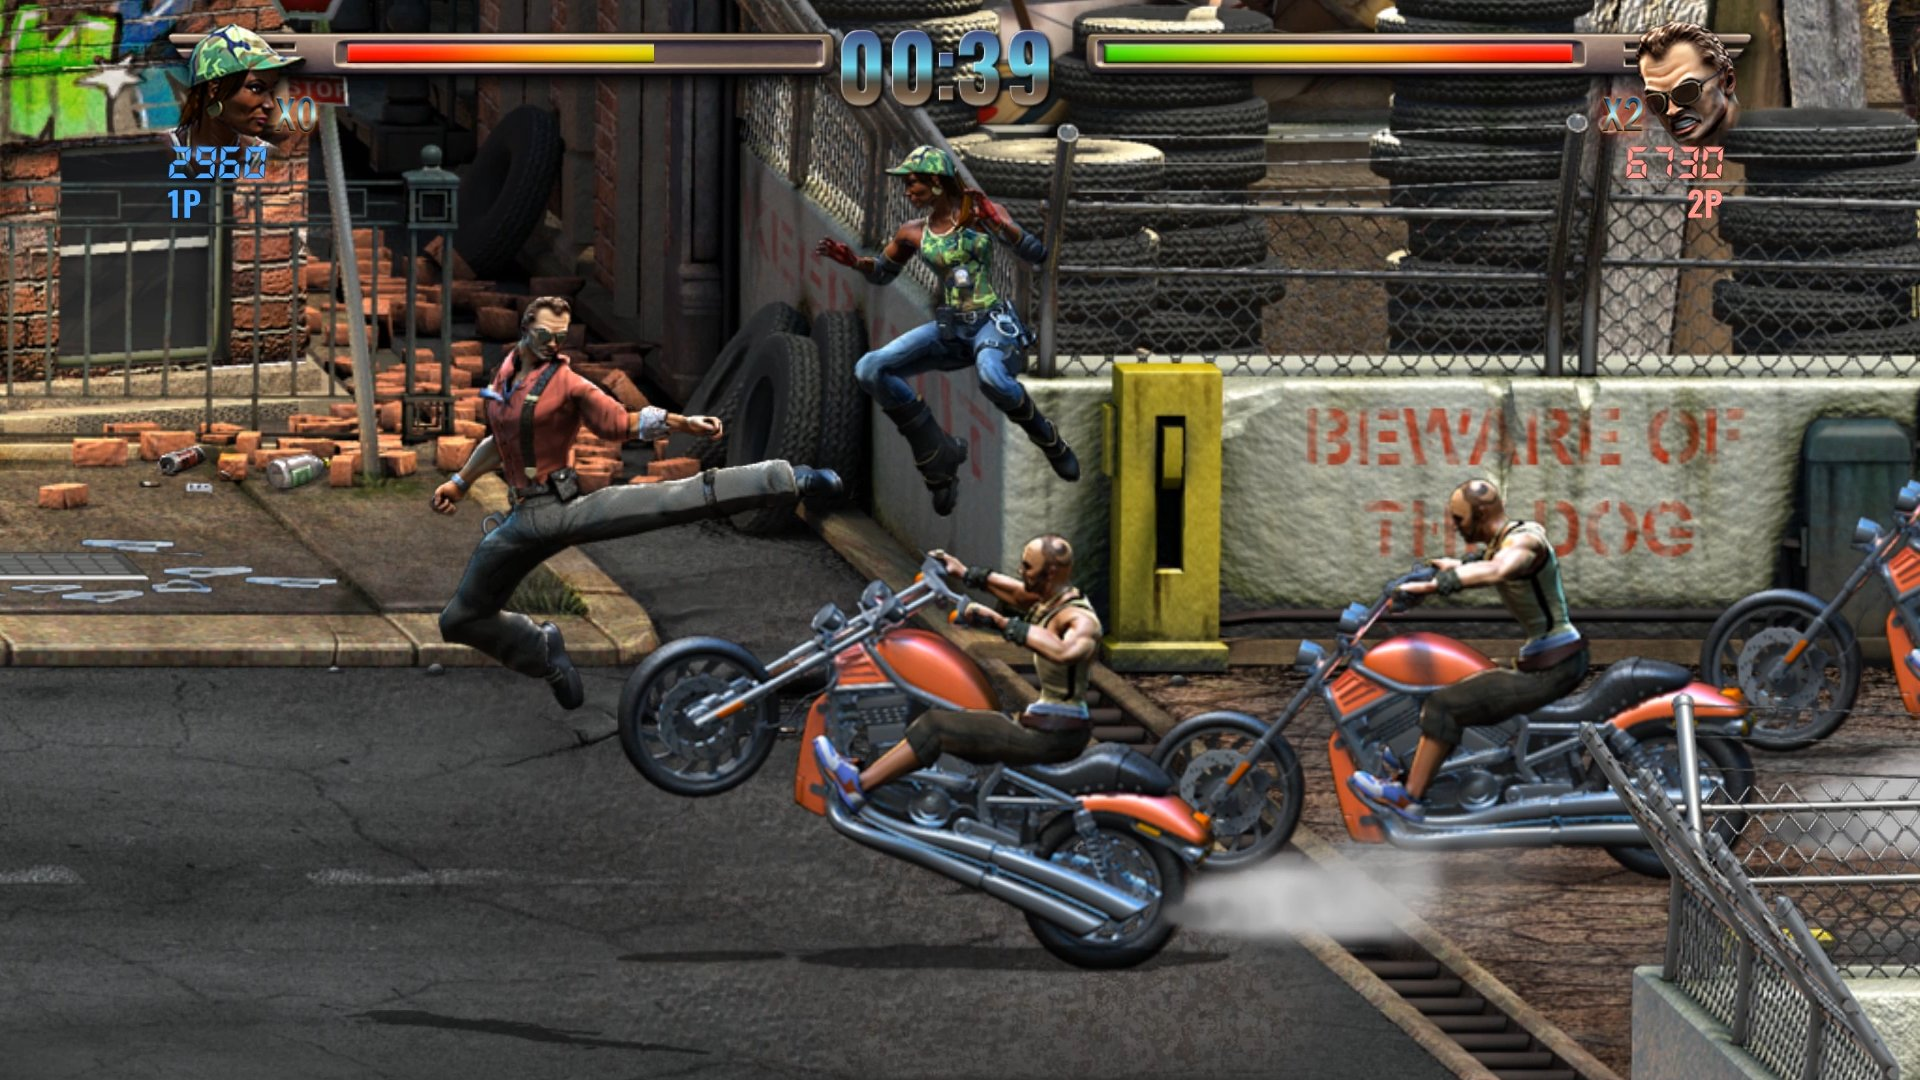 Rick-and-Nikki-Bikes-raging-justice